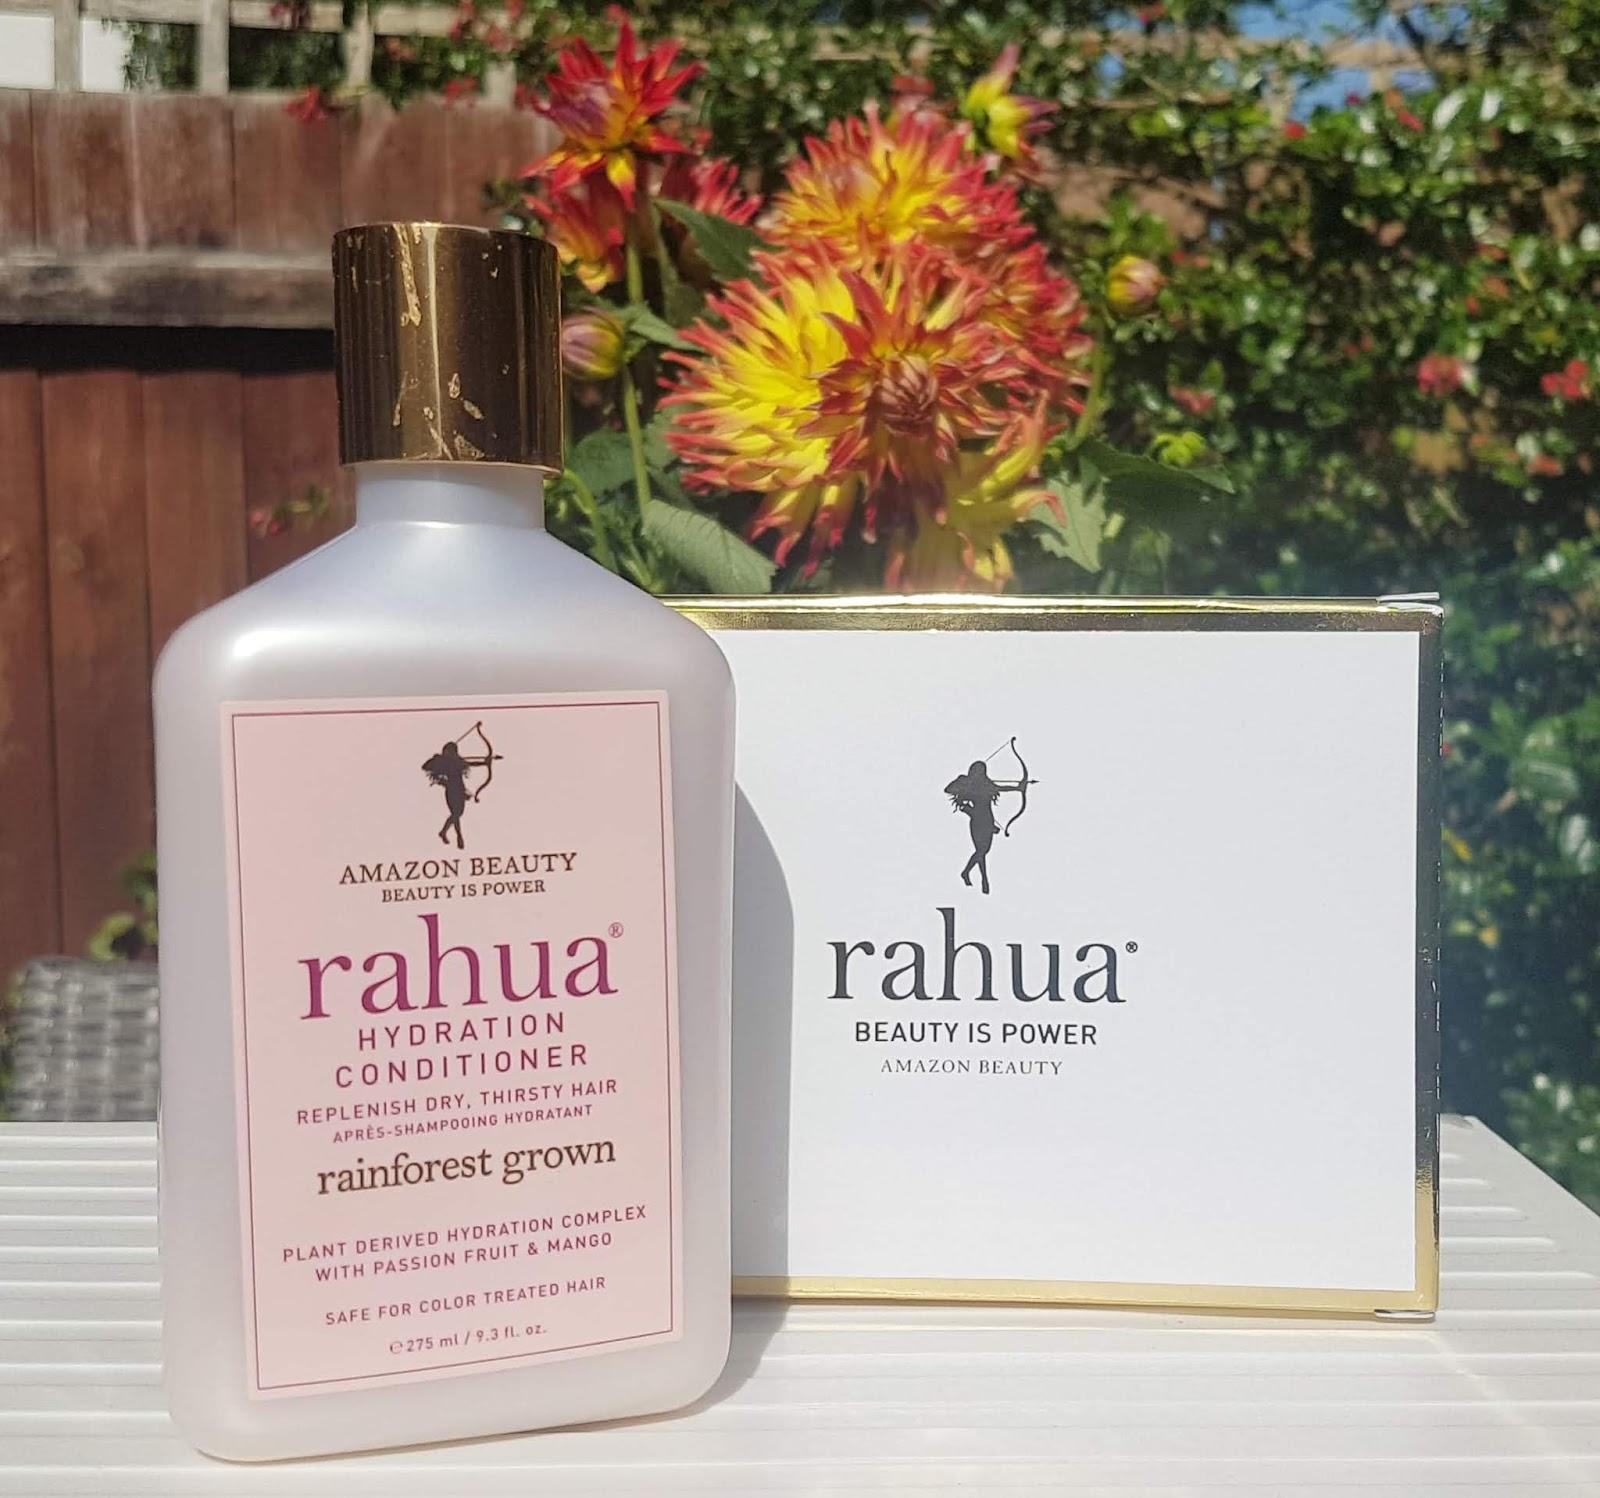 Rahua Beauty - Shampoo Conditioner Review